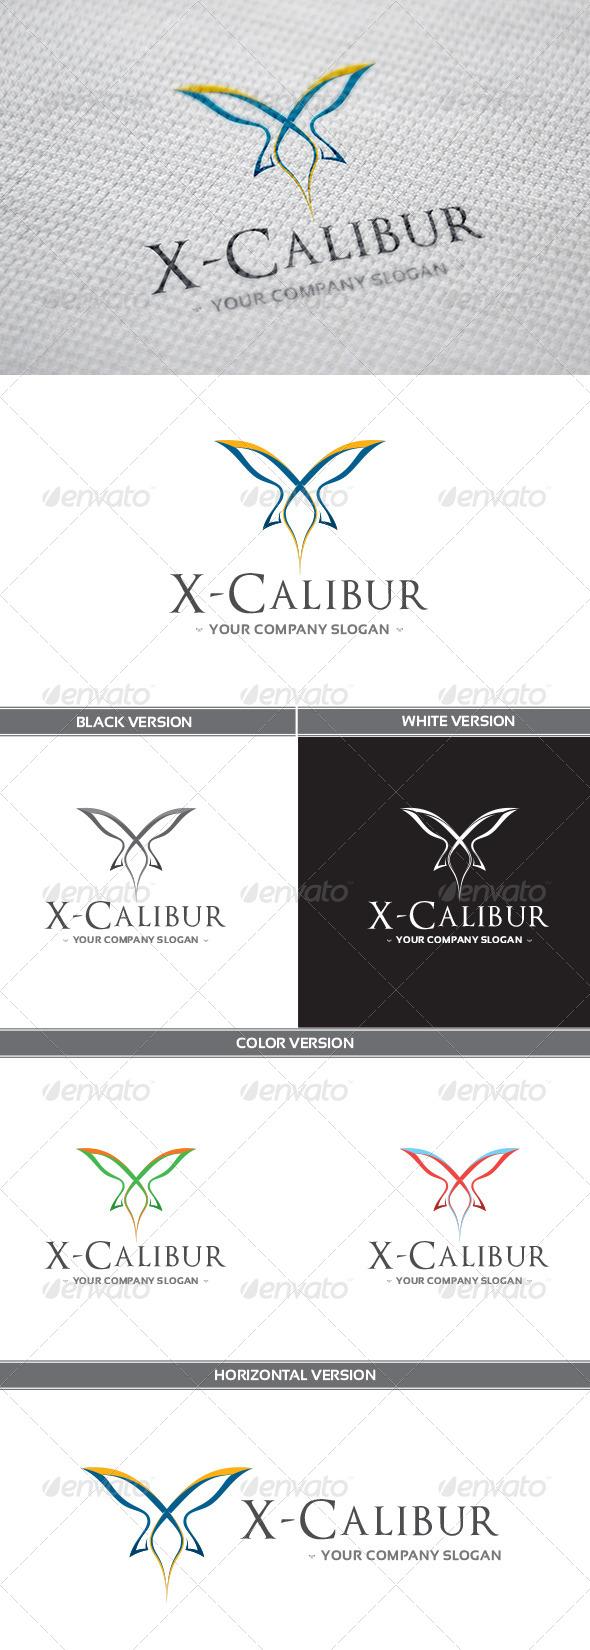 X-Calibur Logo